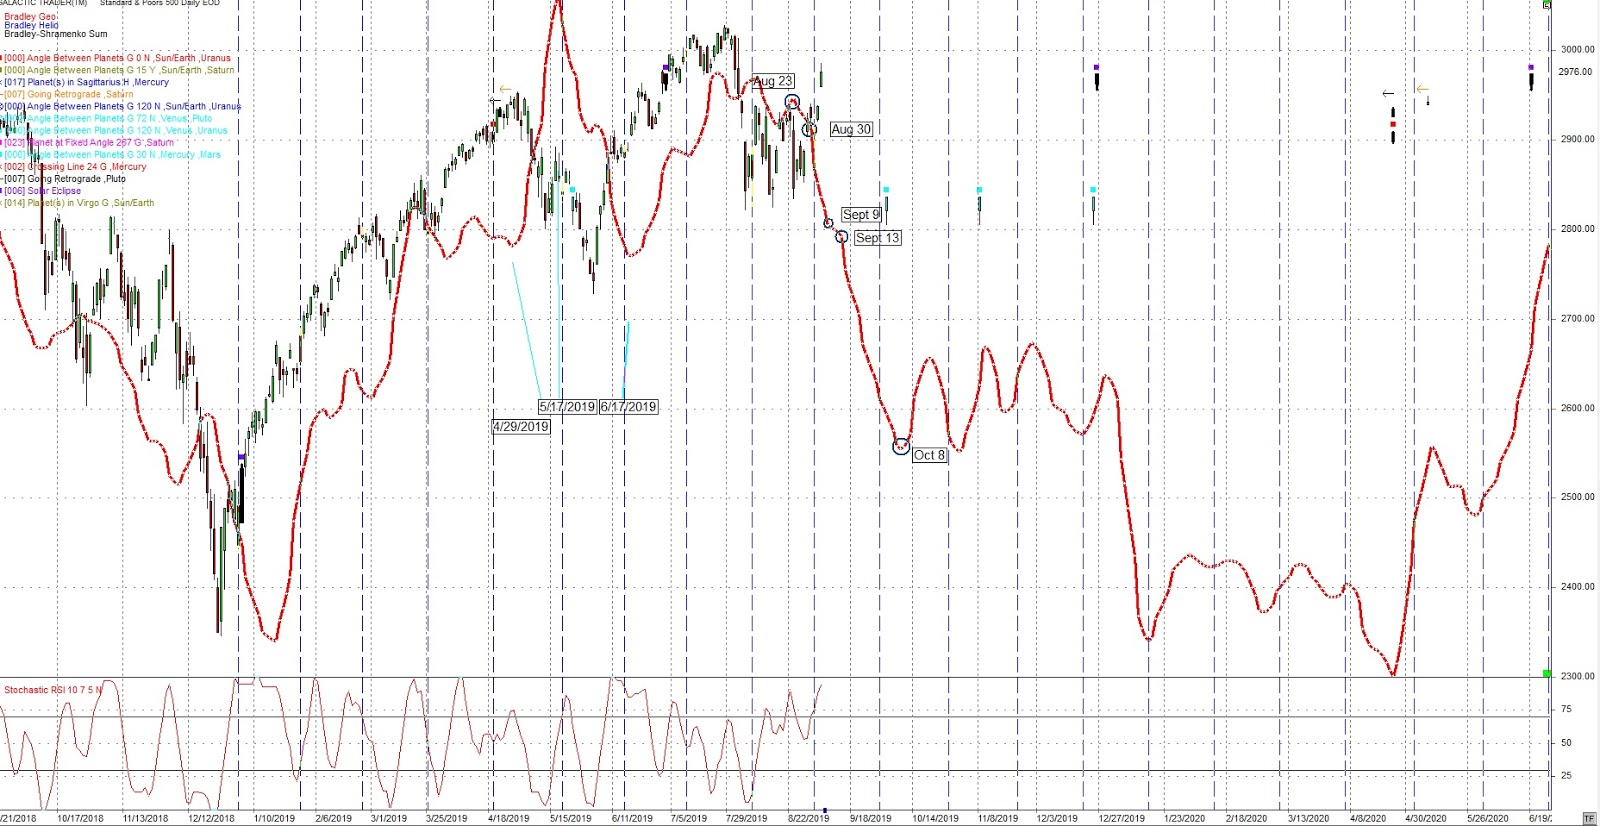 Trading Daze: Financial Astrology - September 9, 2019